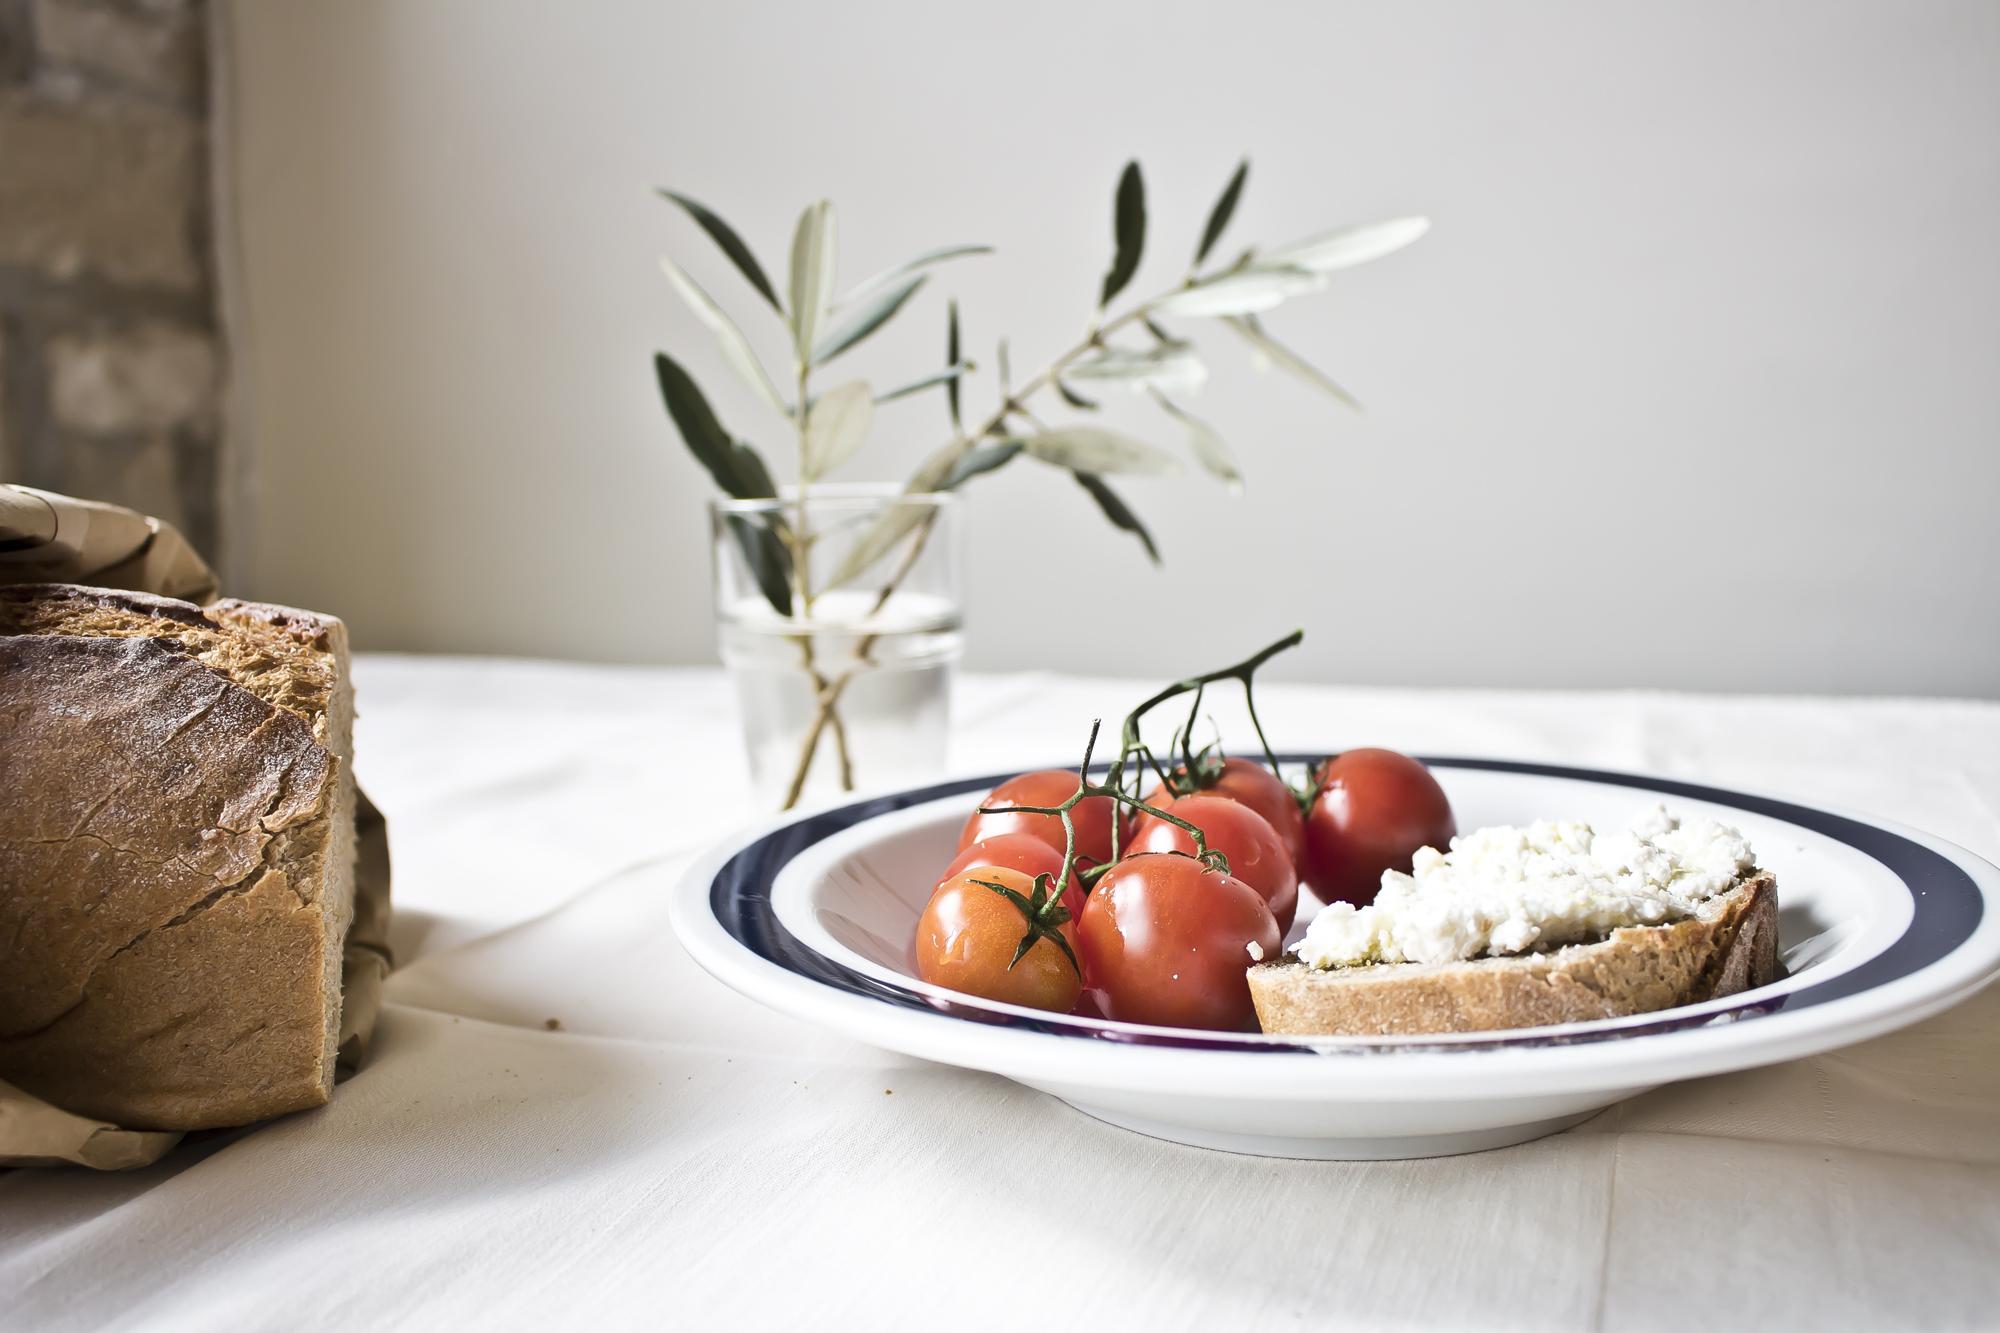 Croatian snack, Part two. • photography by baraperglova.com